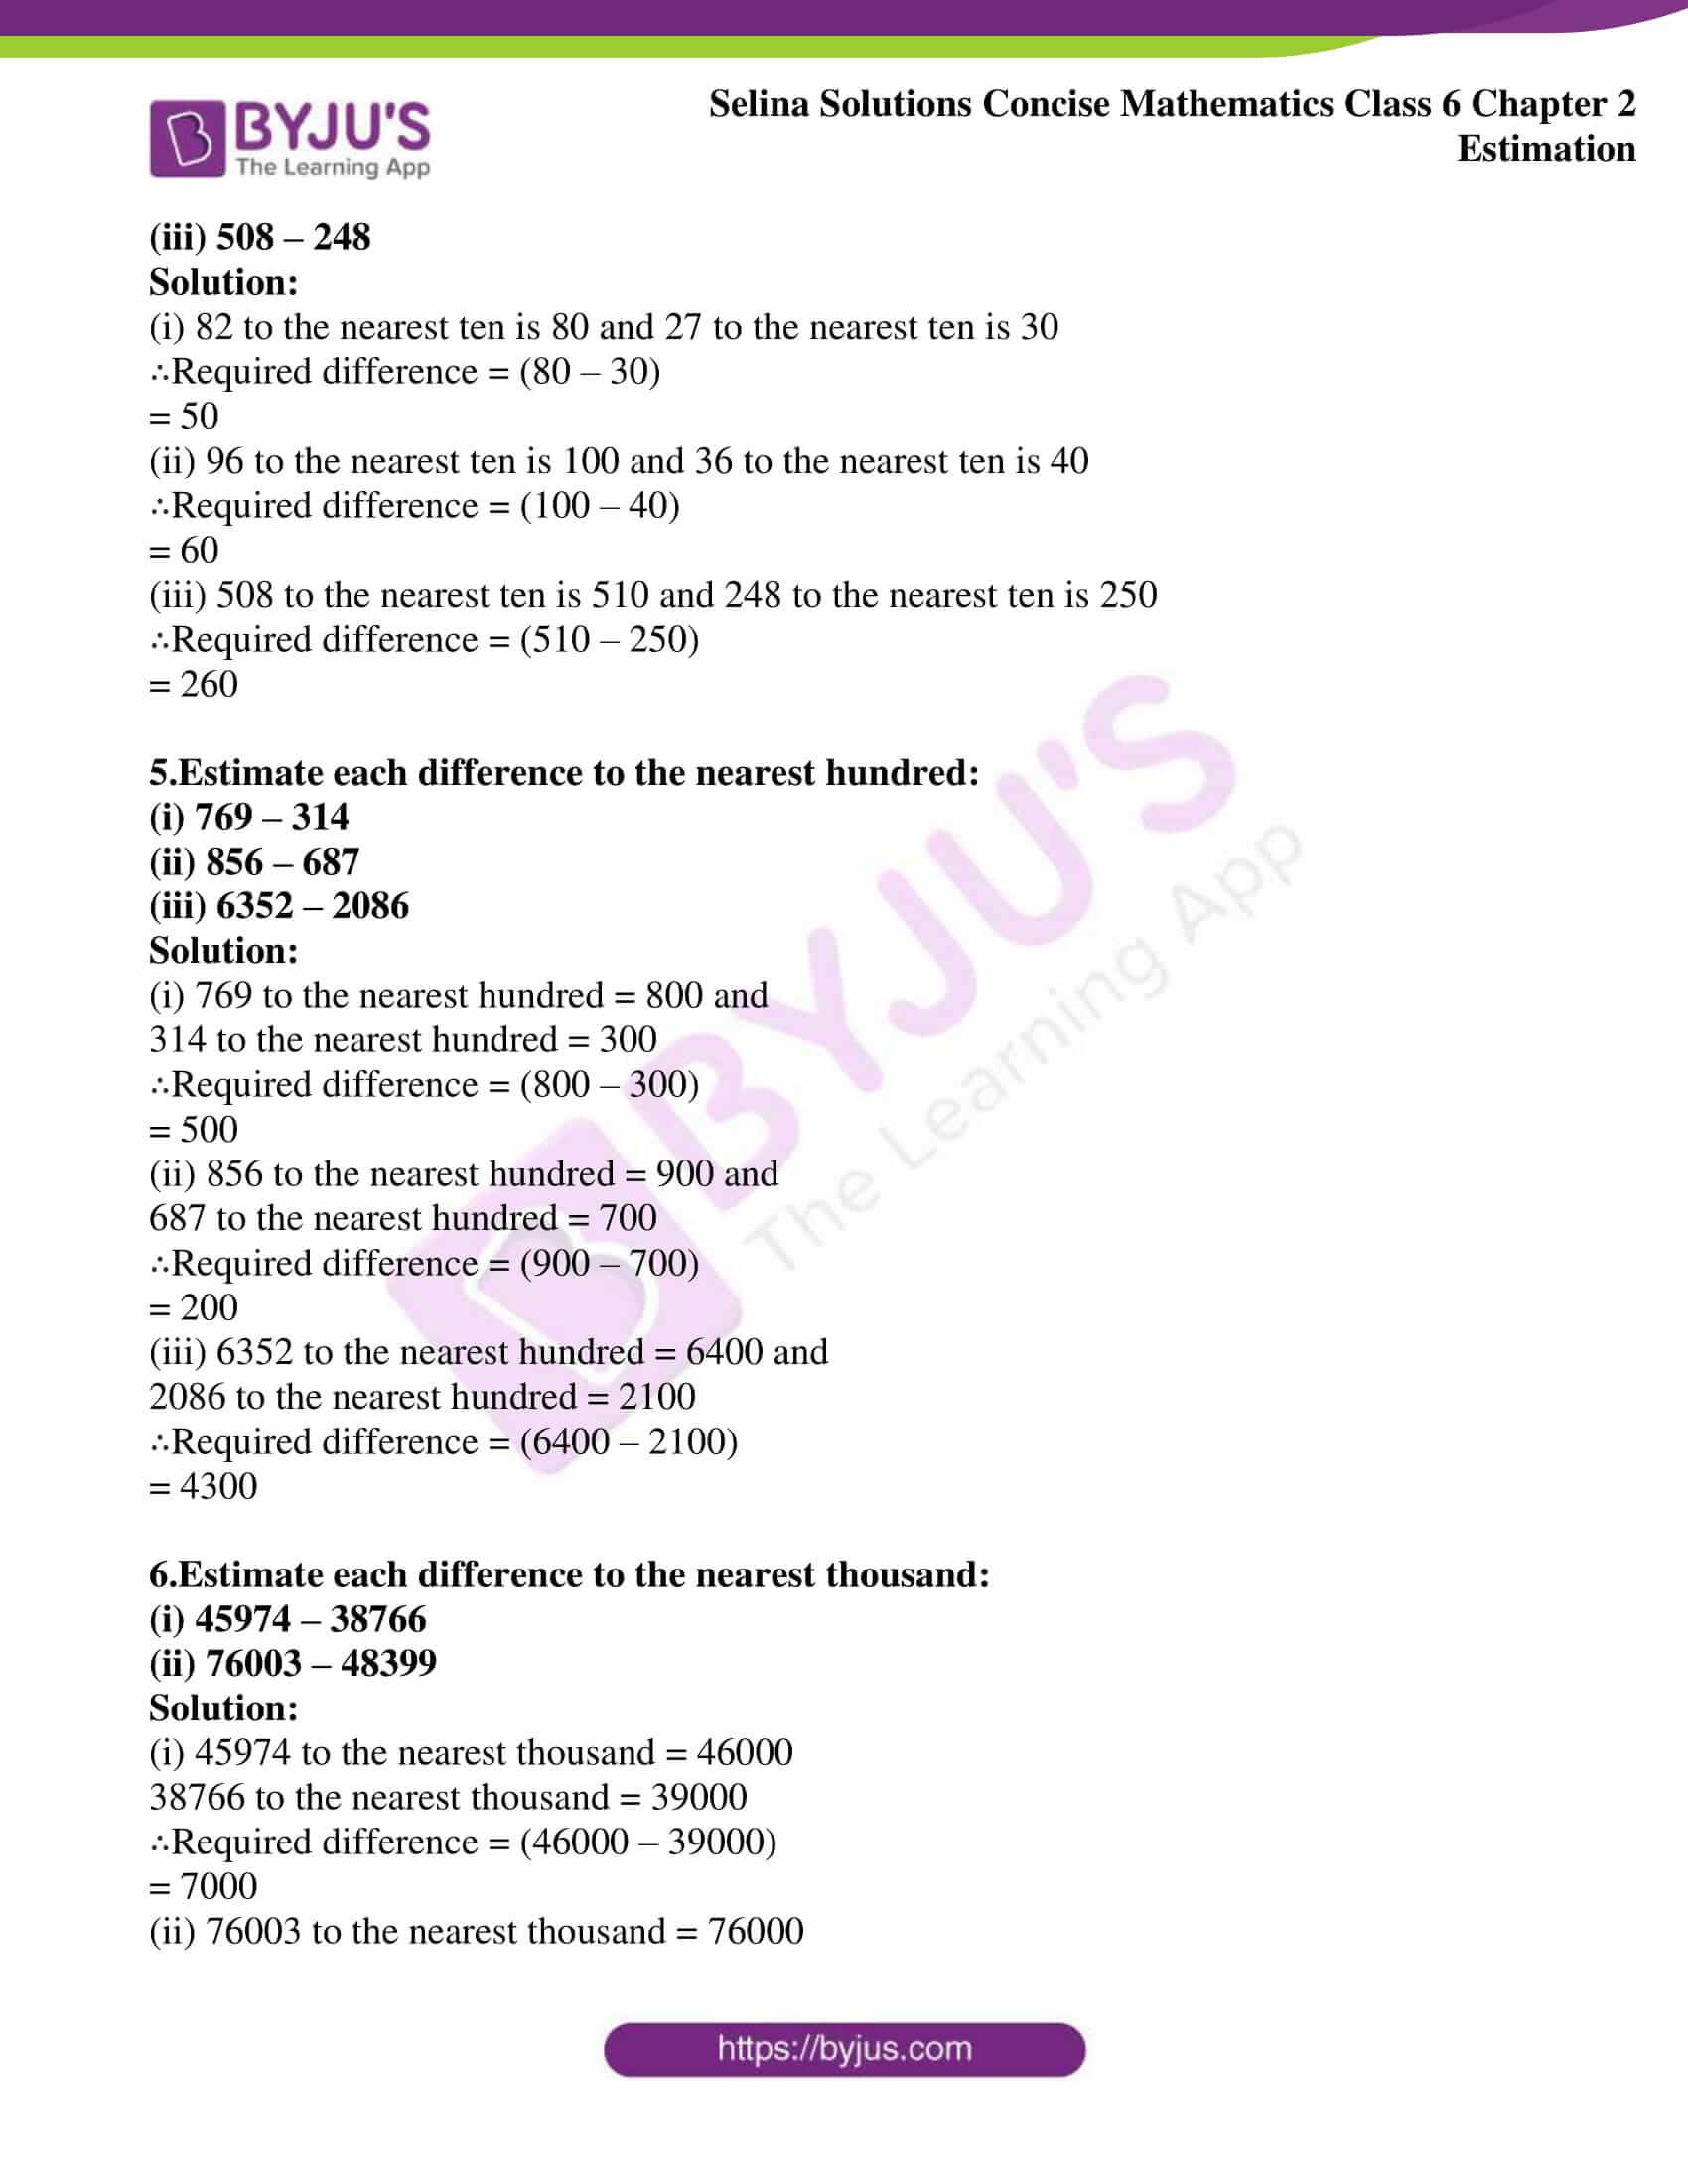 selina sol concise maths class 6 ch2 ex 2b 3